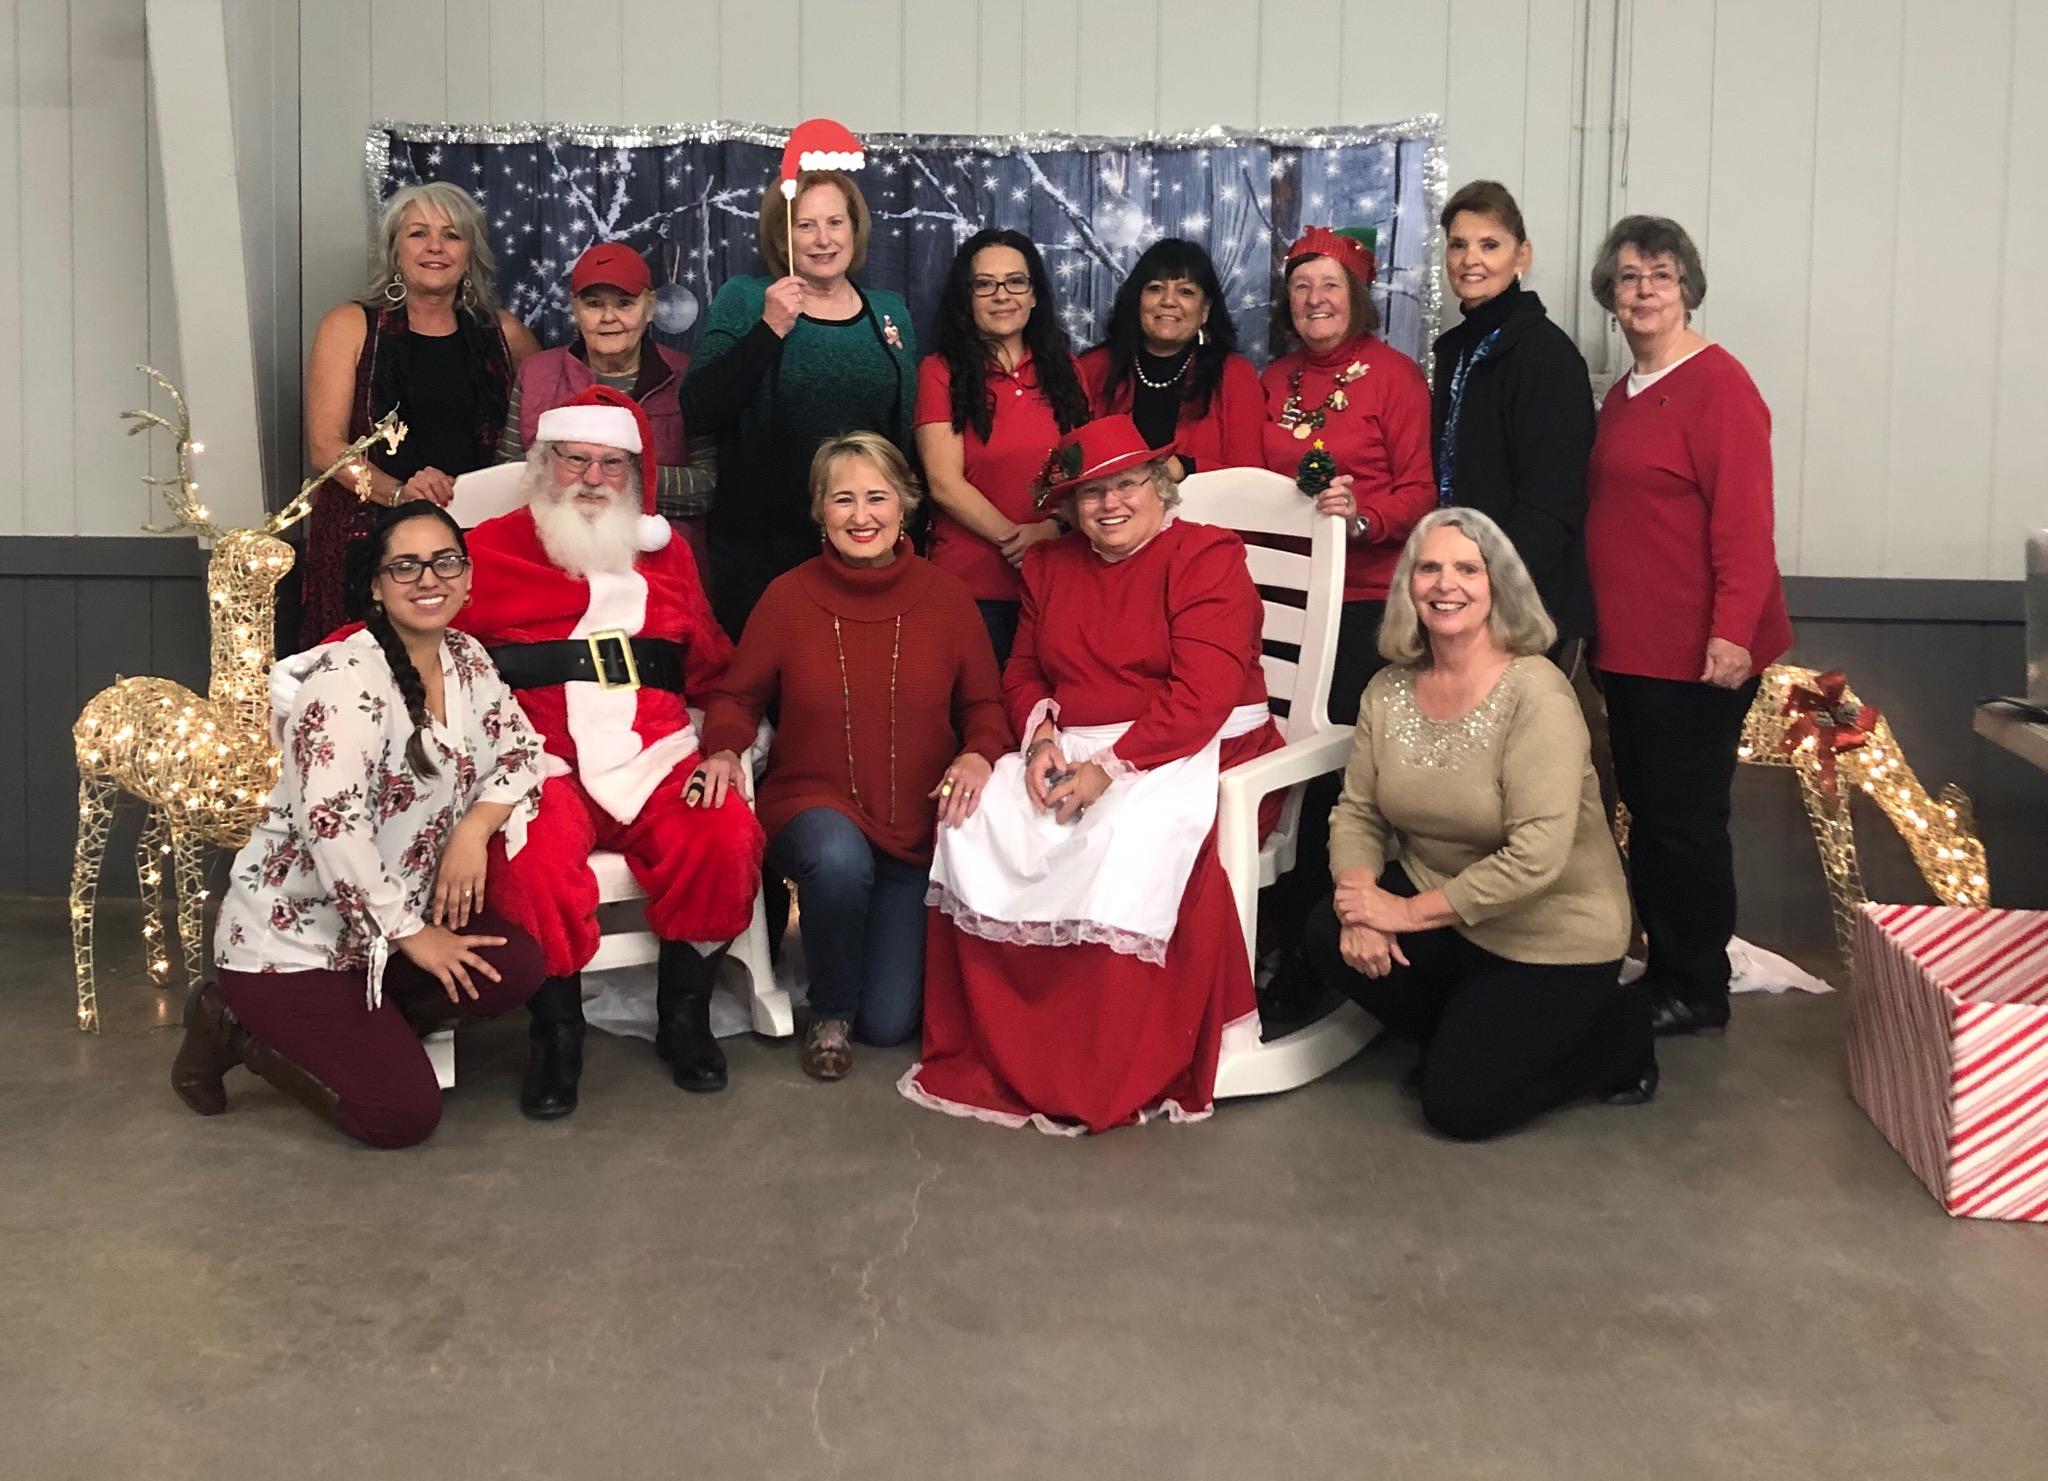 Valencia County Christmas Party 12/7/19